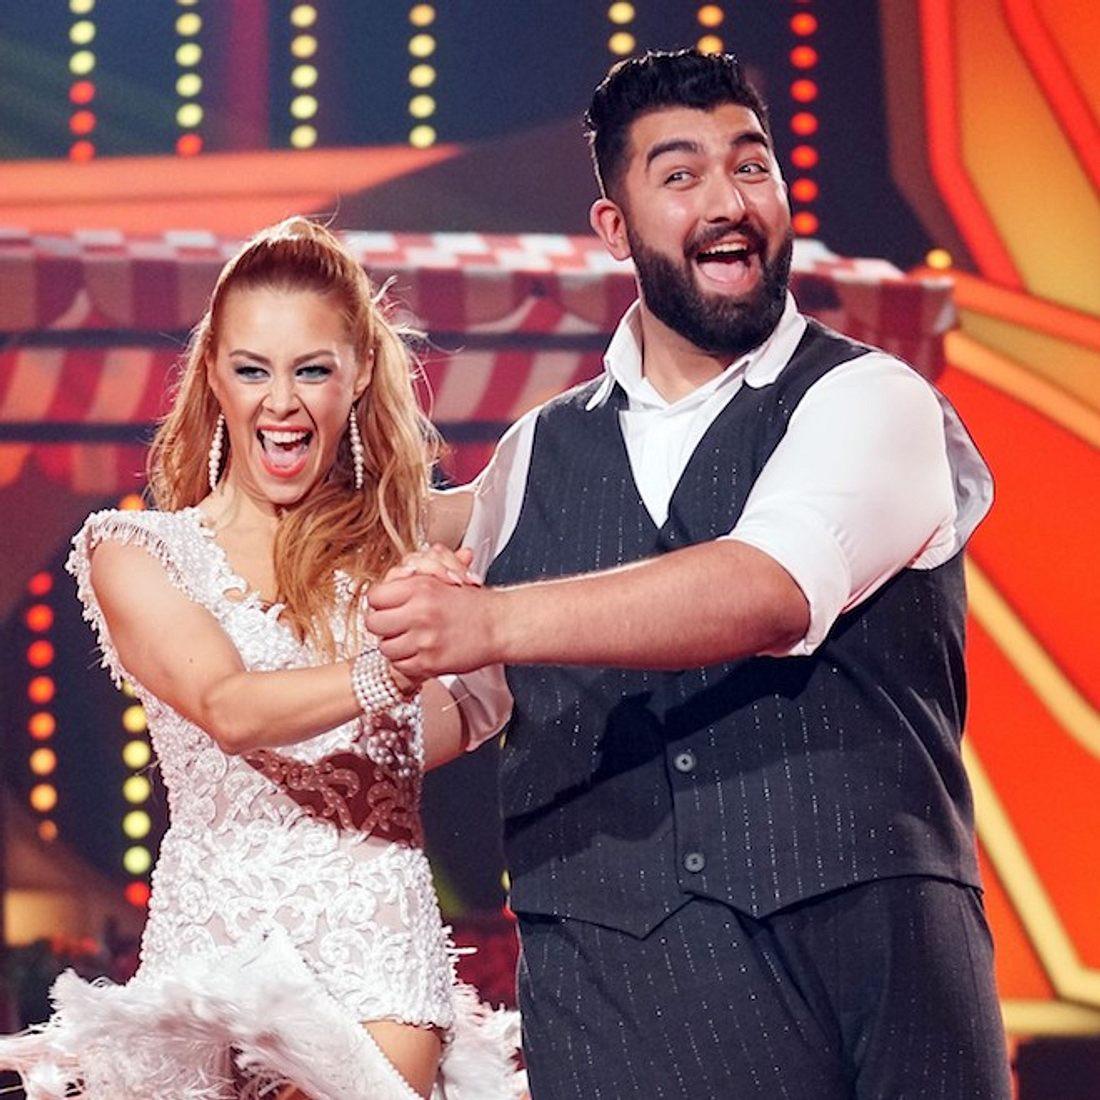 Let's Dance-Abnehmrekord: Faisal verliert 15 Kilo